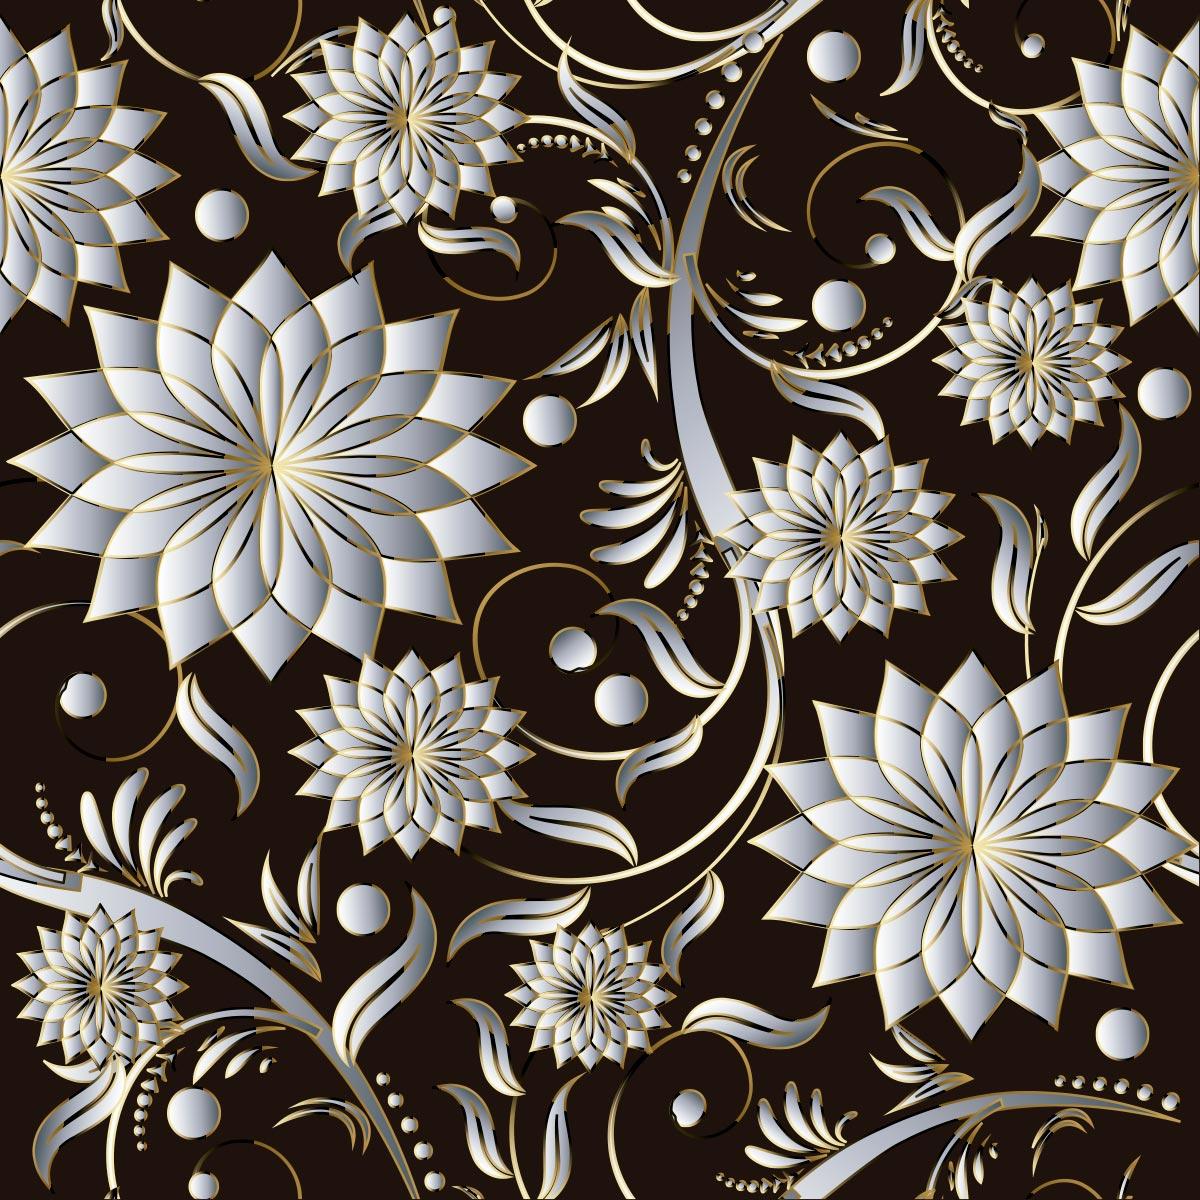 Papel de Parede 3D Floral Prata Galhos Gold Adesivo